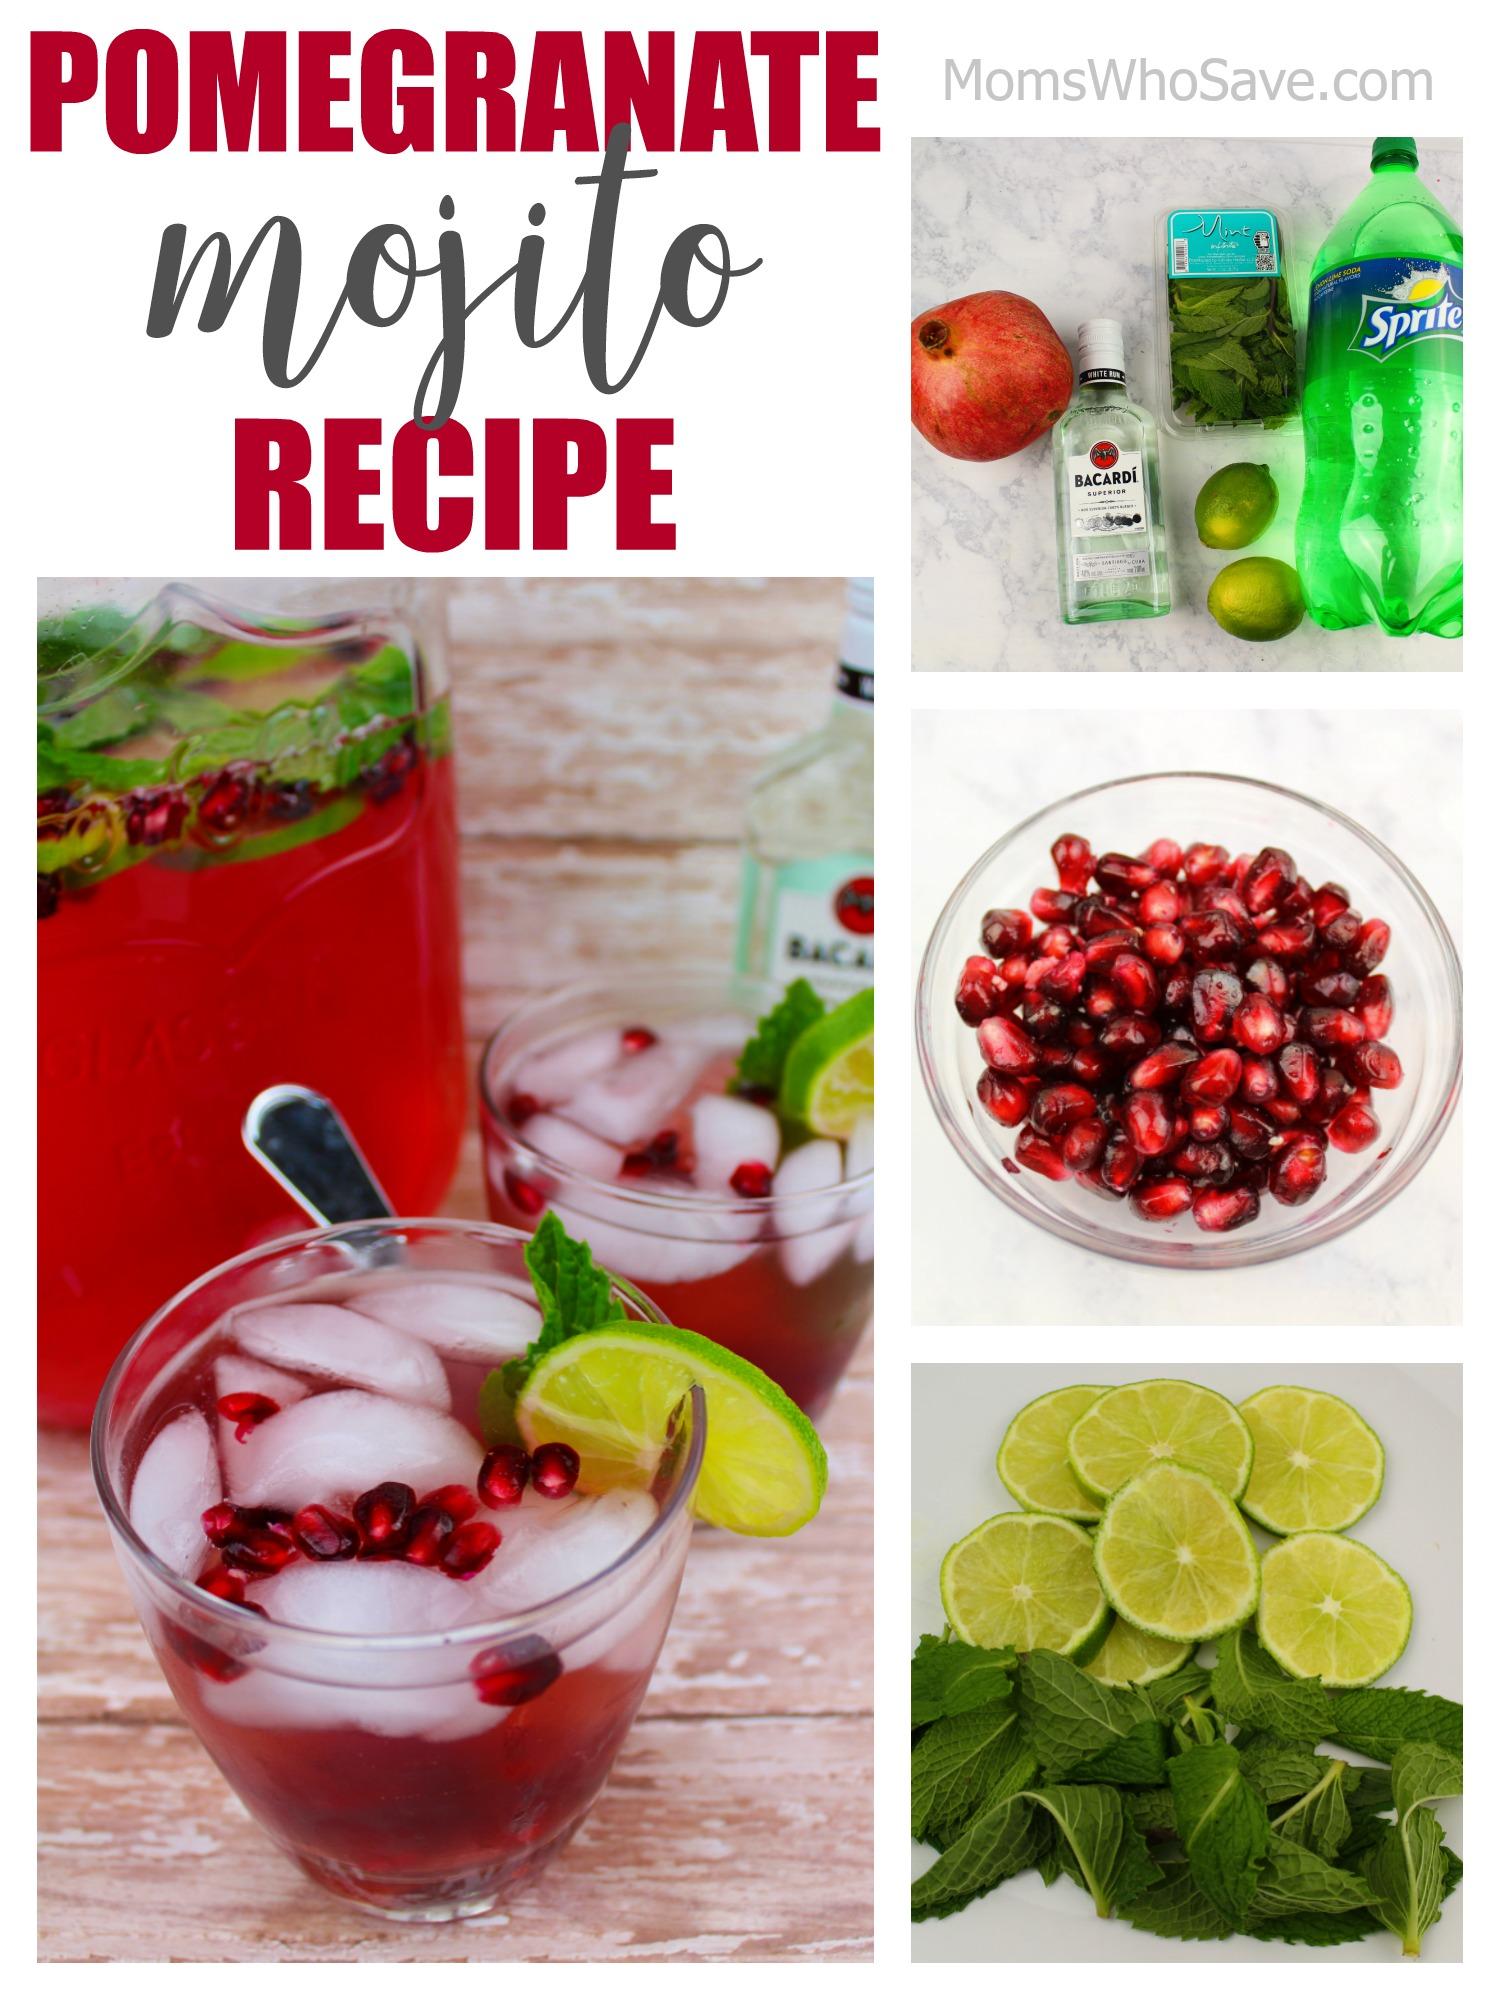 recipe for pomegranate mojitos